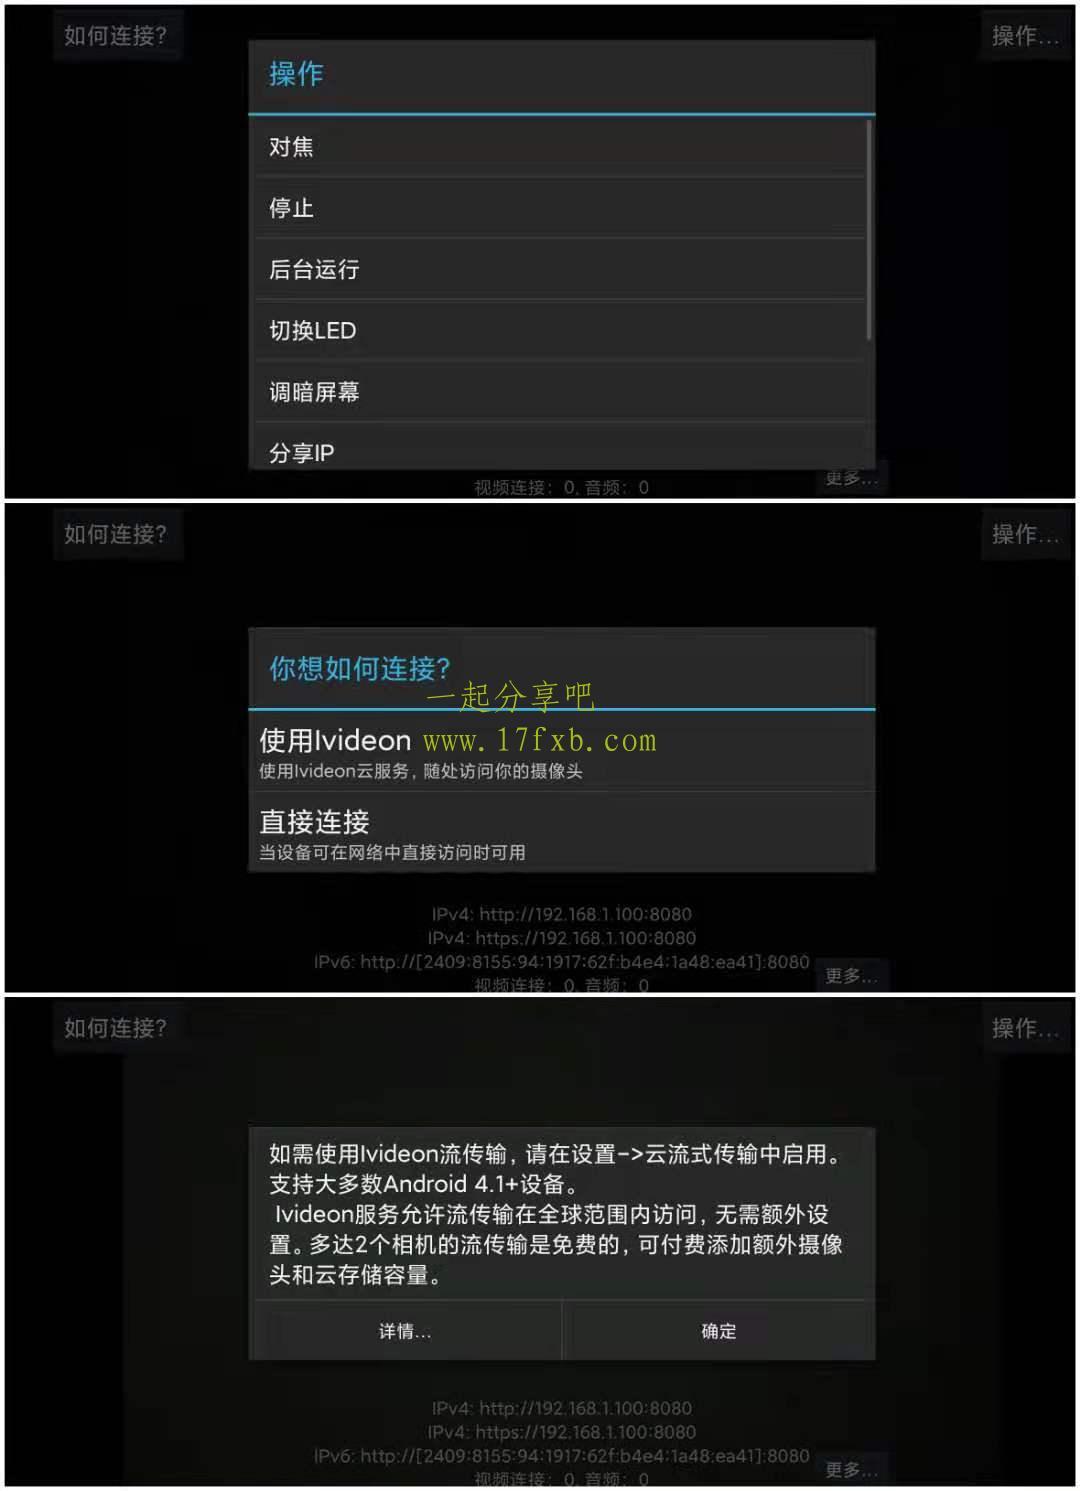 IP Webcam PRO 专业版 v1.14.3 让旧手机变摄像头 第1张